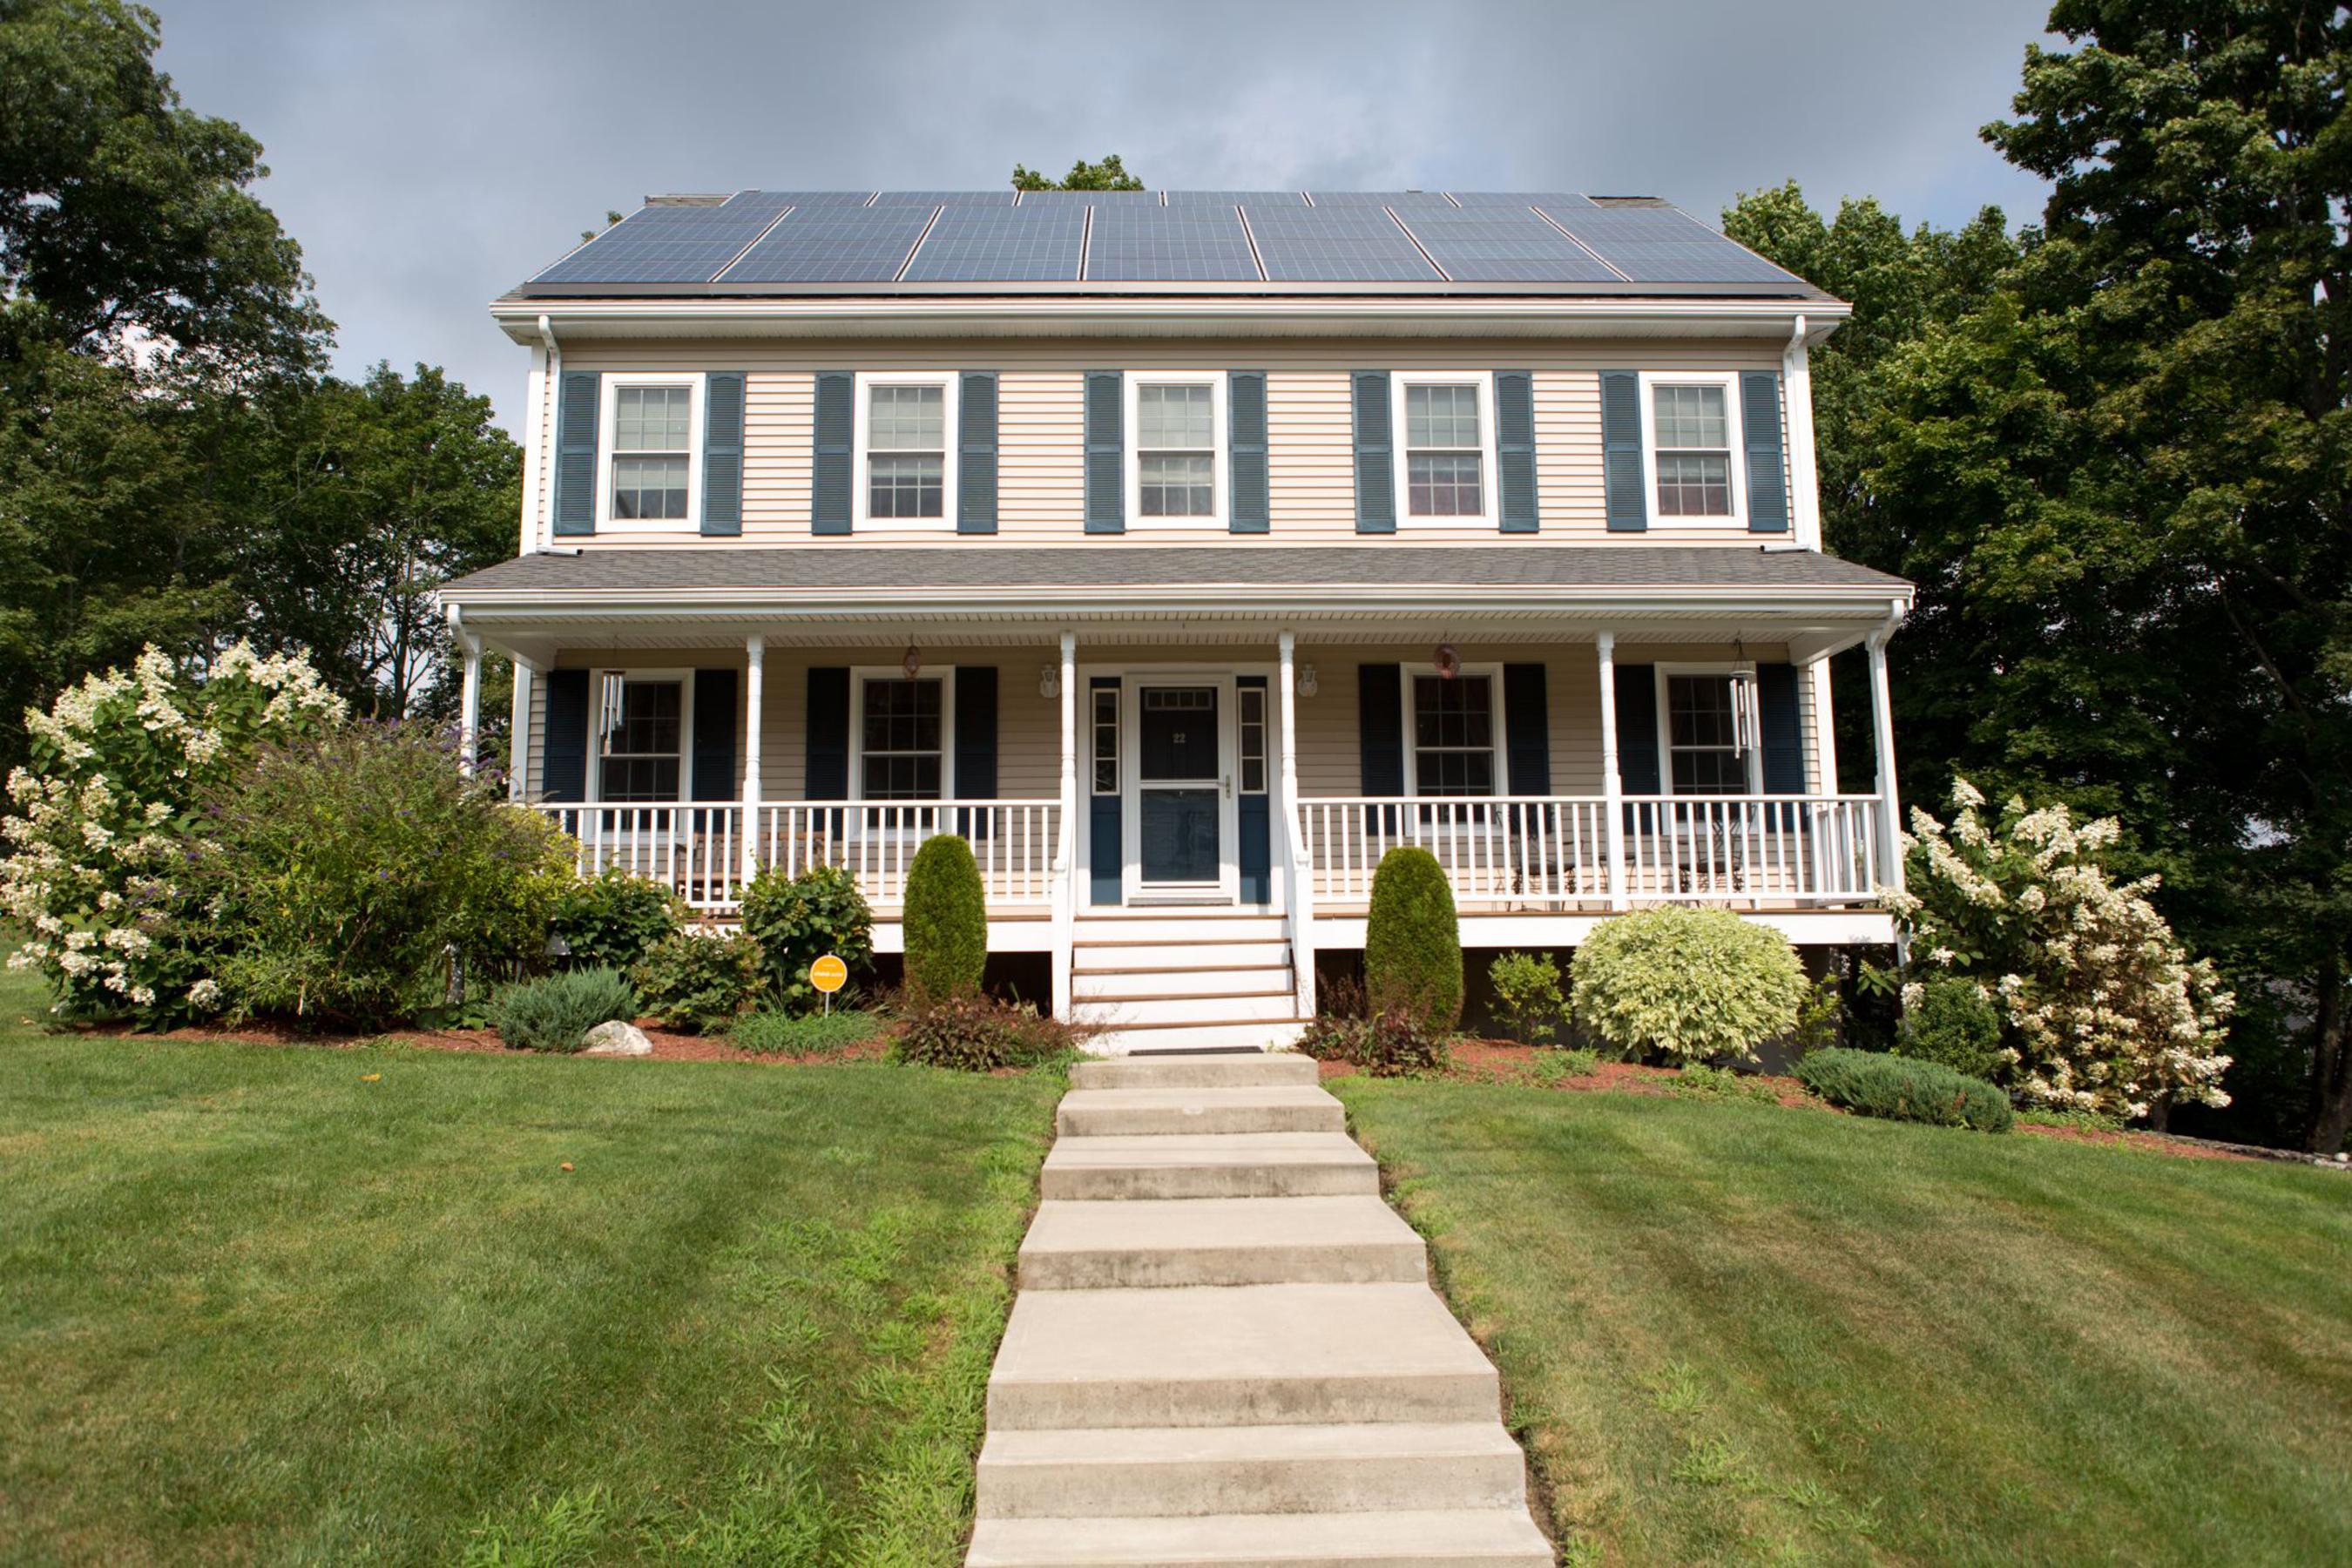 Home in Woburn, Massachusetts area runs on solar energy provided by Vivint Solar. (PRNewsFoto/Vivint Solar) (PRNewsFoto/VIVINT SOLAR)